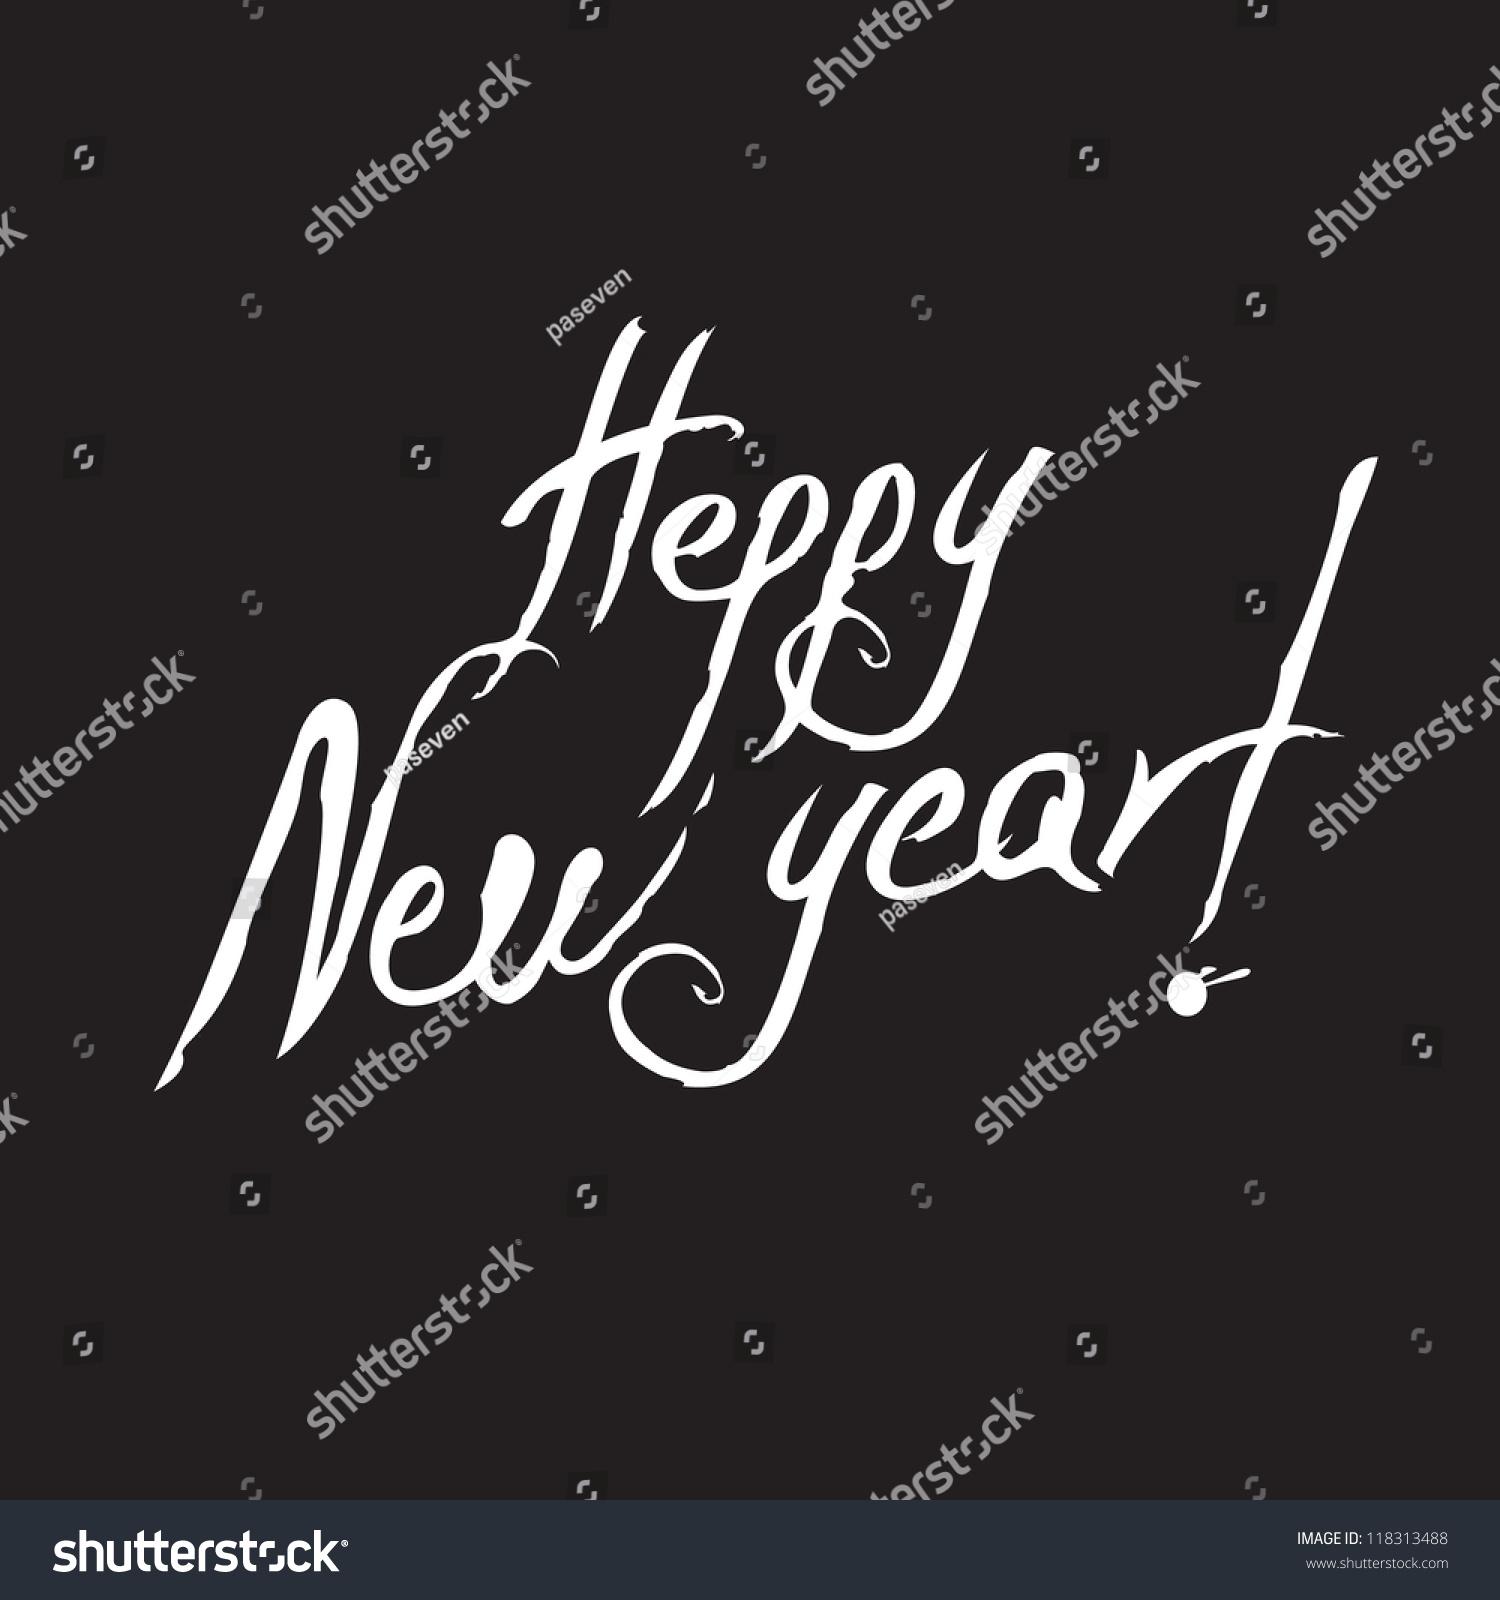 happy new year essay india Happy new year 2017 essay paragraph in english hindi - 1st jan naya saal mubarak nibandh for kids happy new year 2017 essay paragraph in english hindi new.